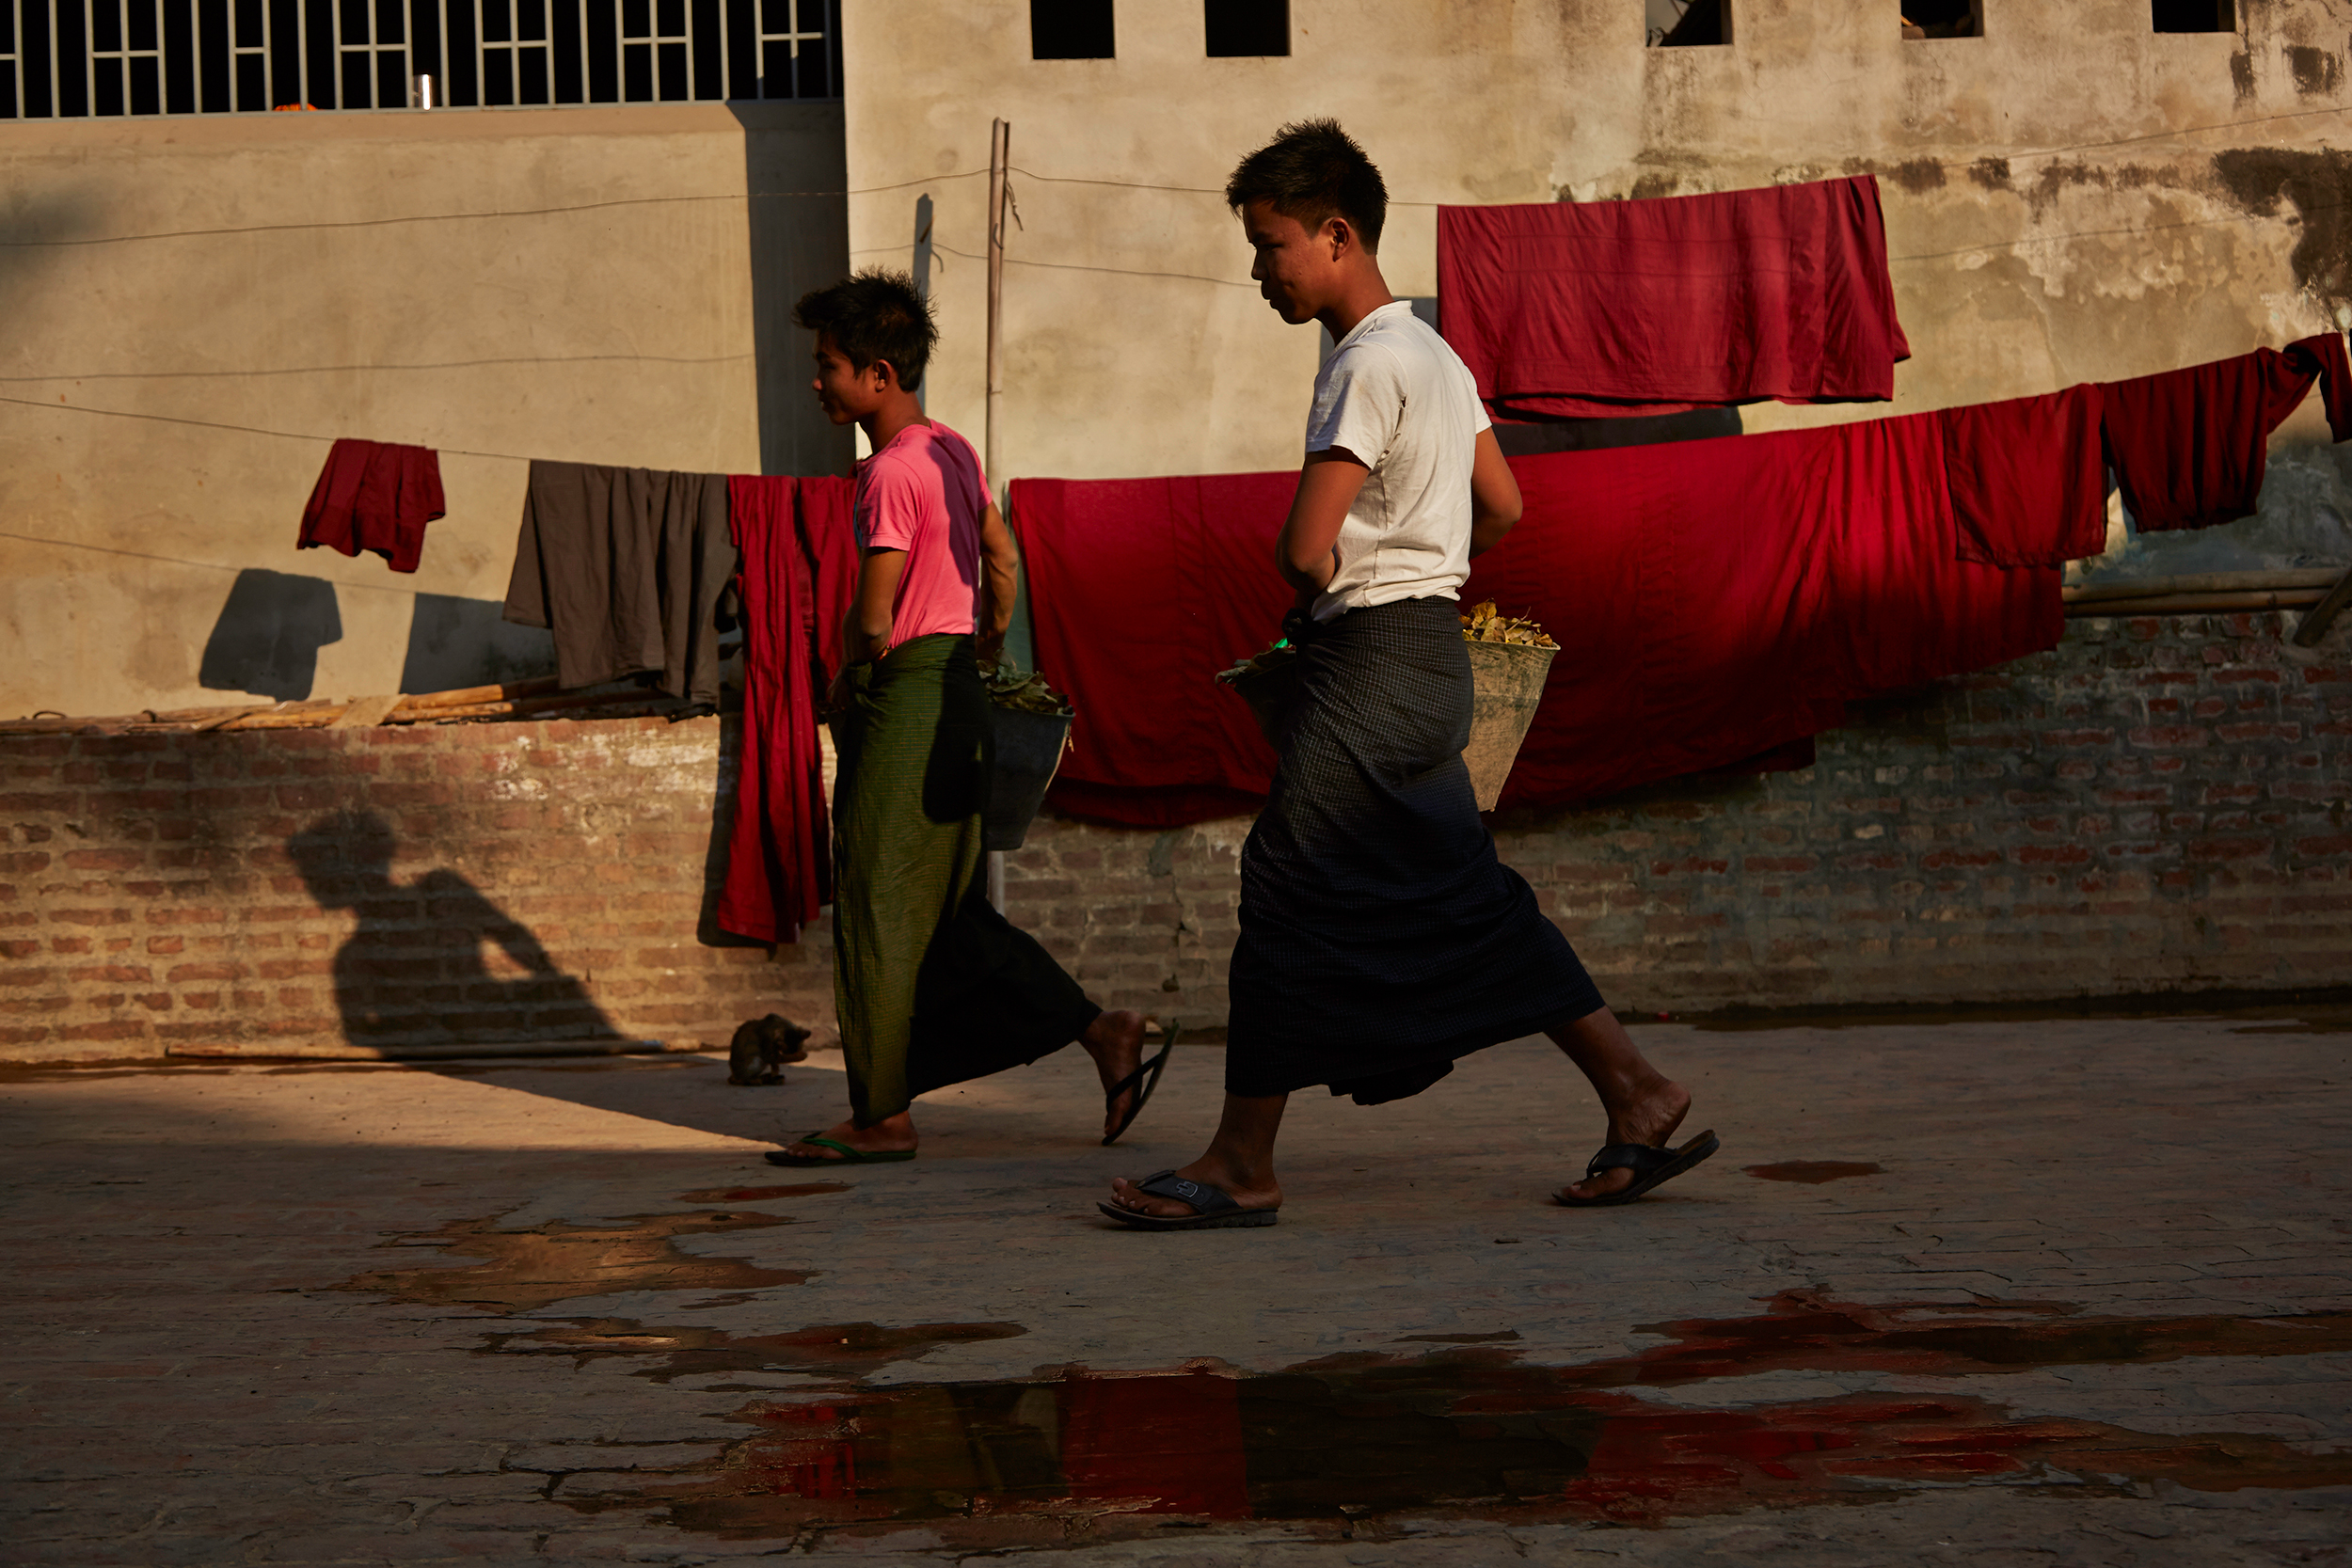 Kanjana-Chaiwatanachai-Image-Works_Bagan-PM_2014.01.16_0087w.jpg